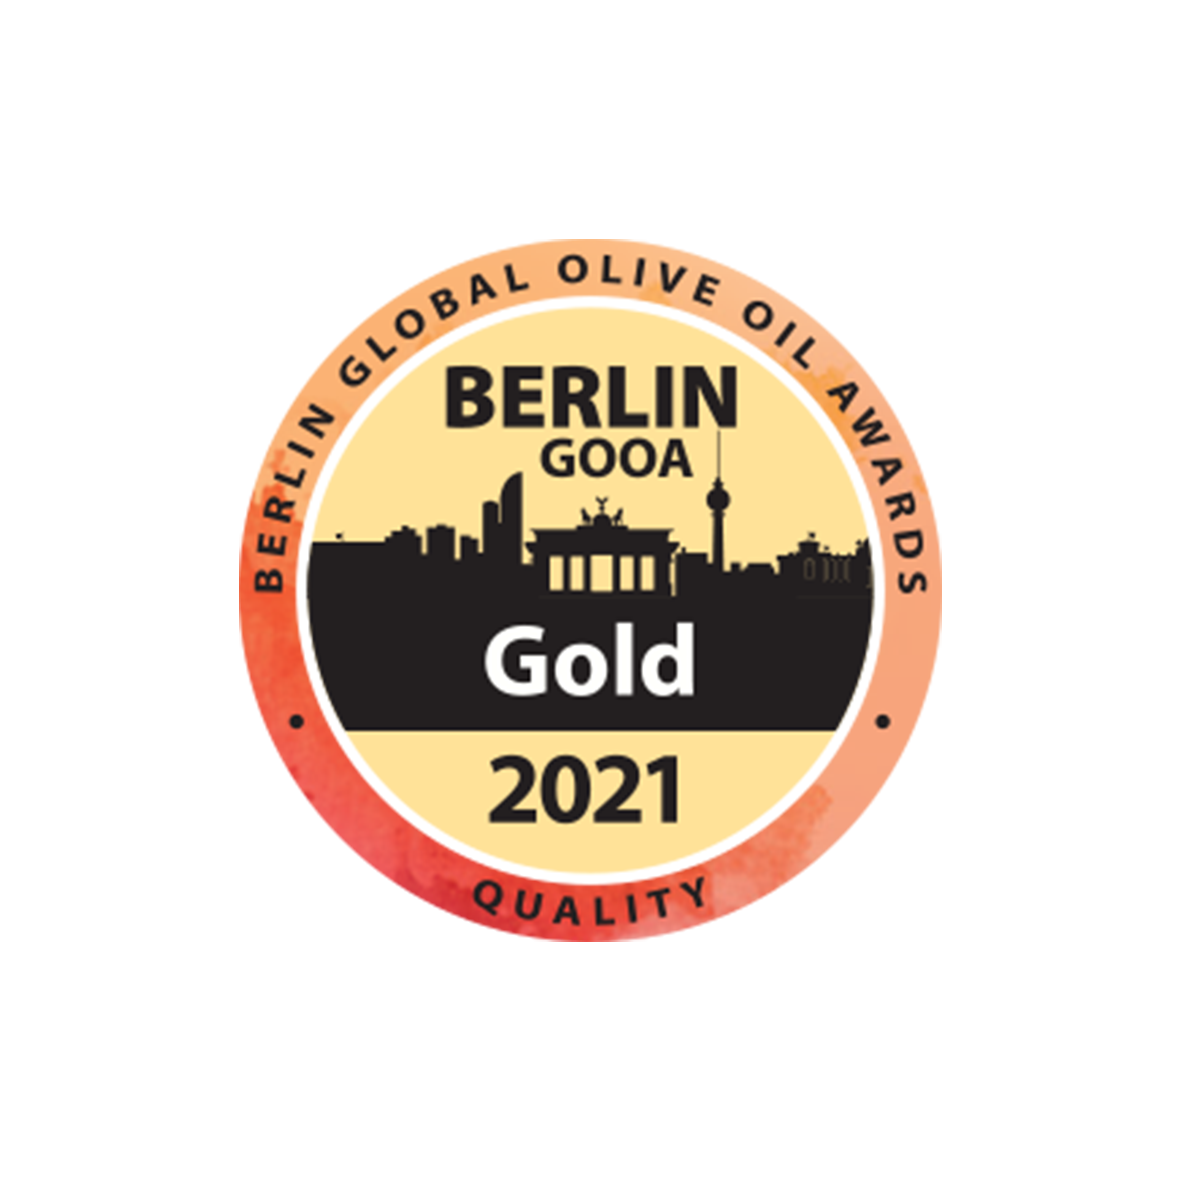 berlinAwardGold_quality-3_NEW